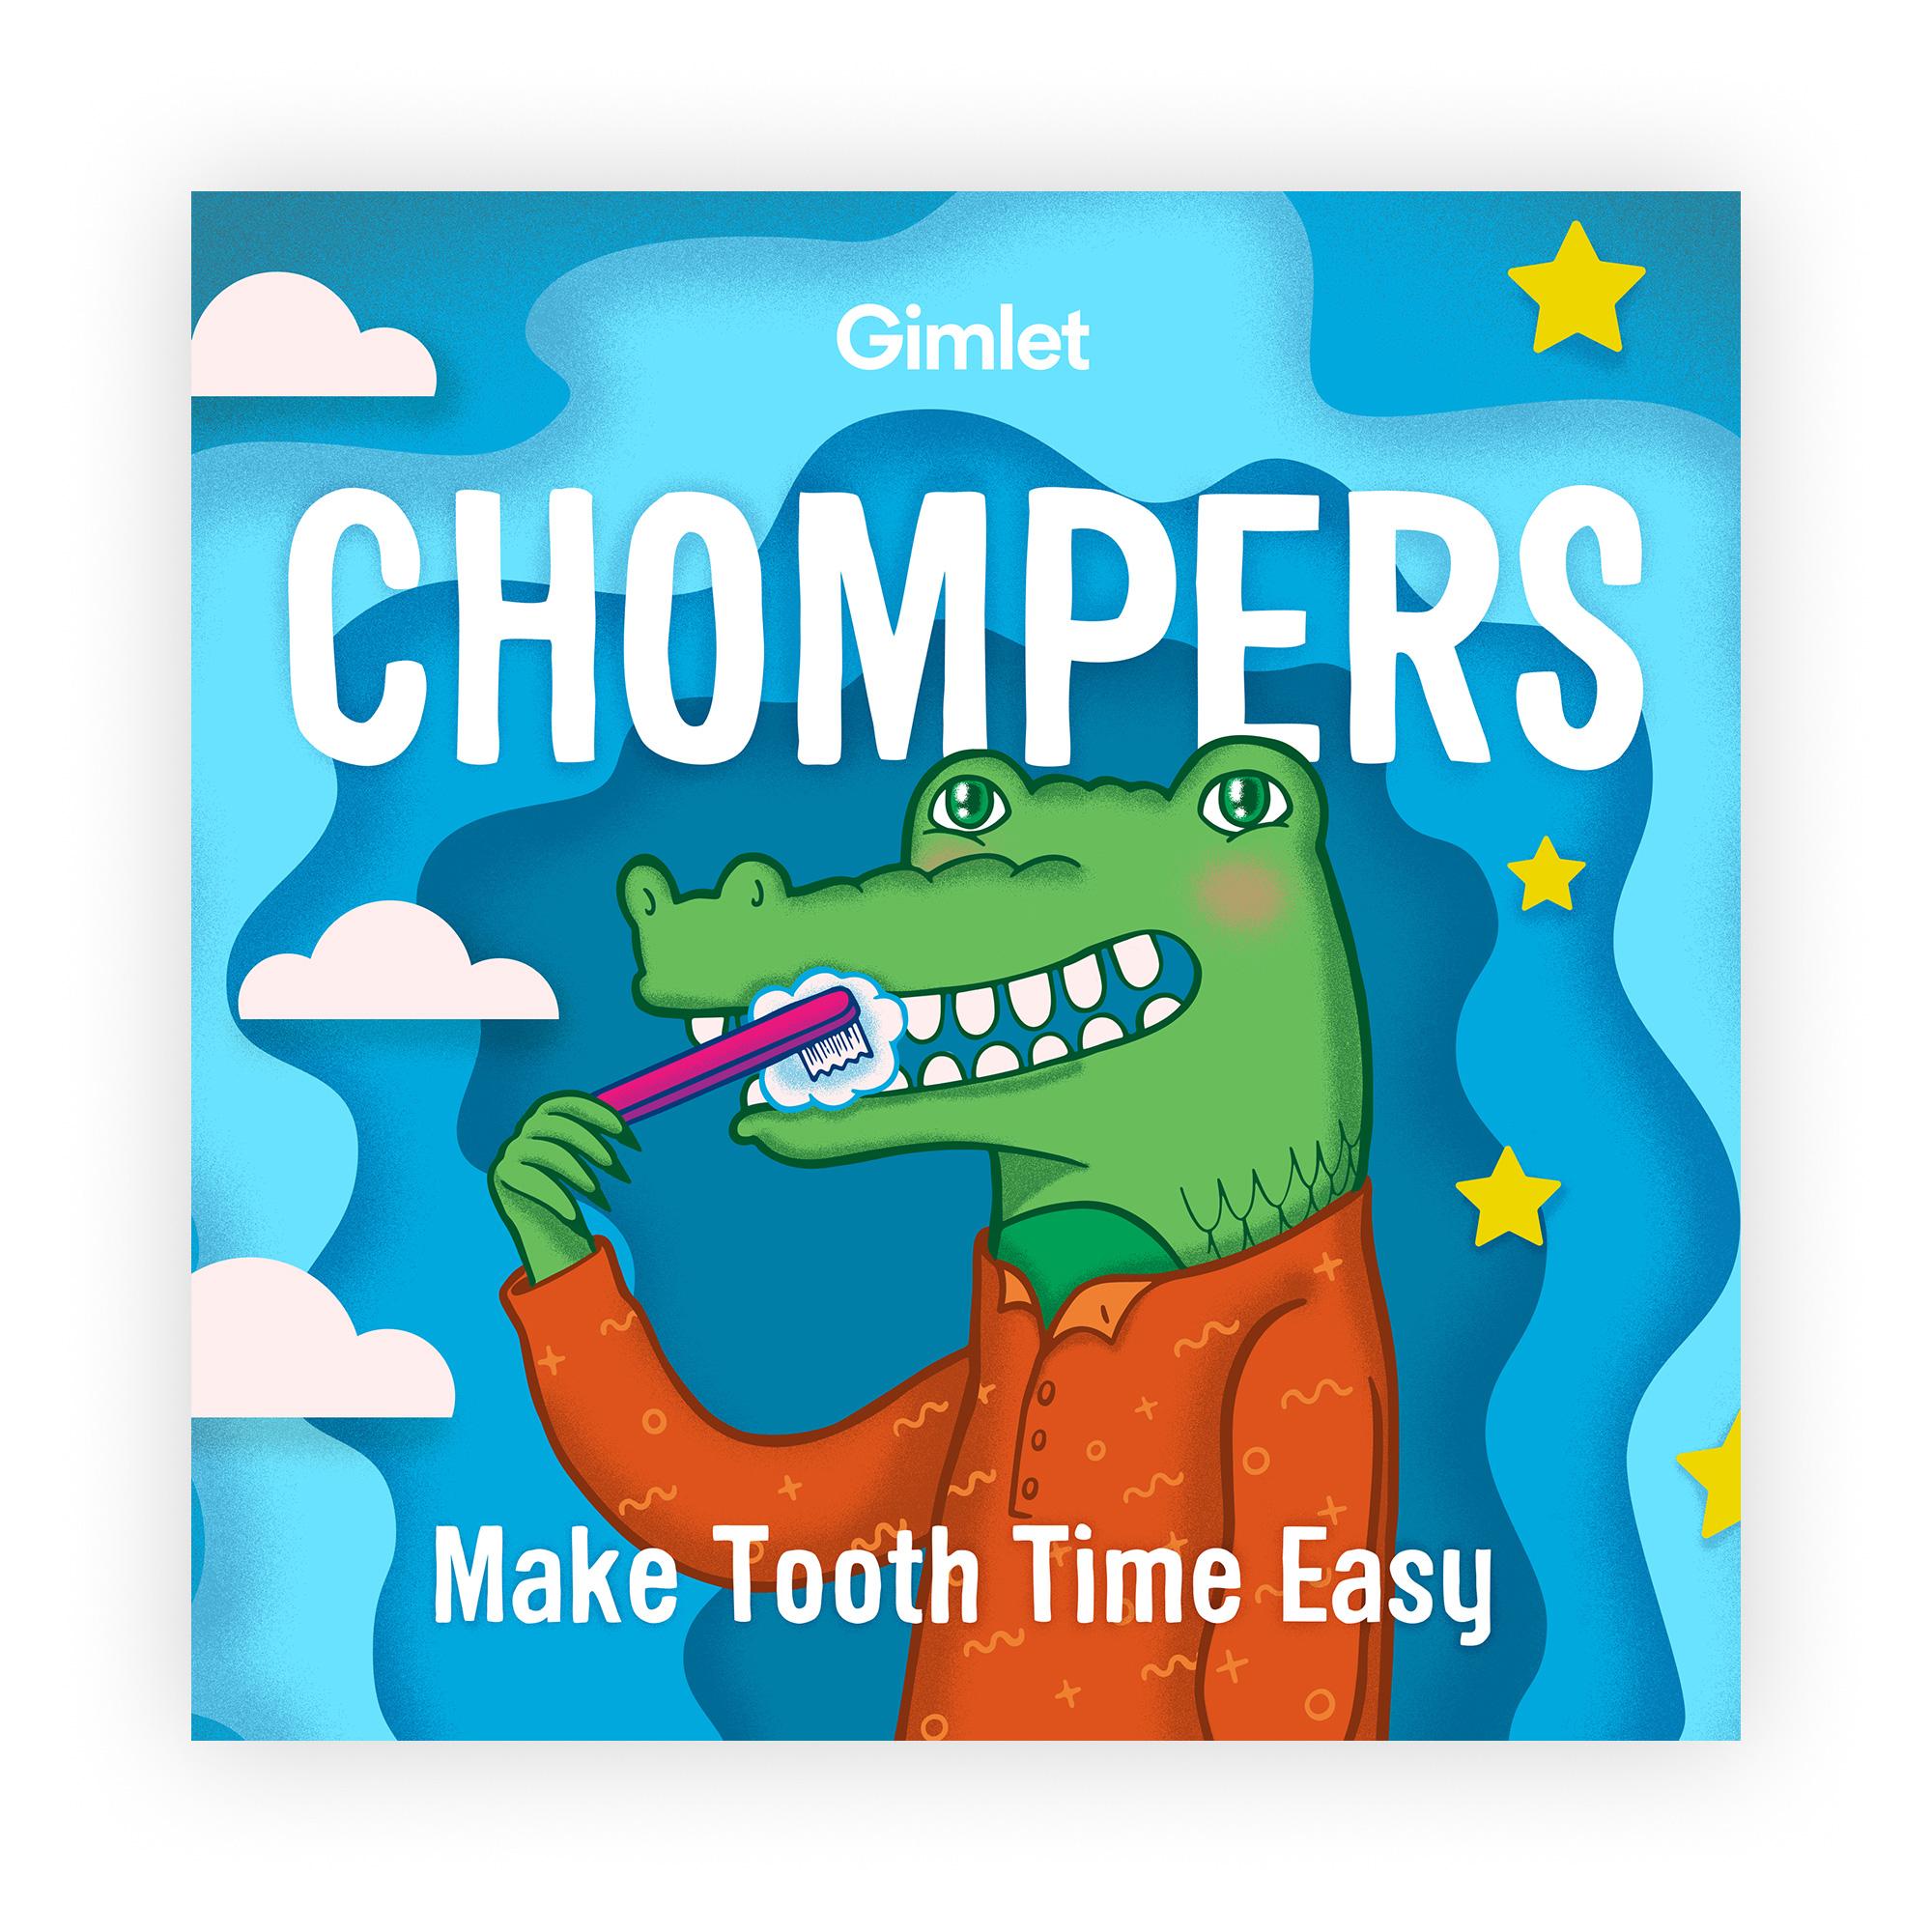 chompers-art-final.jpg